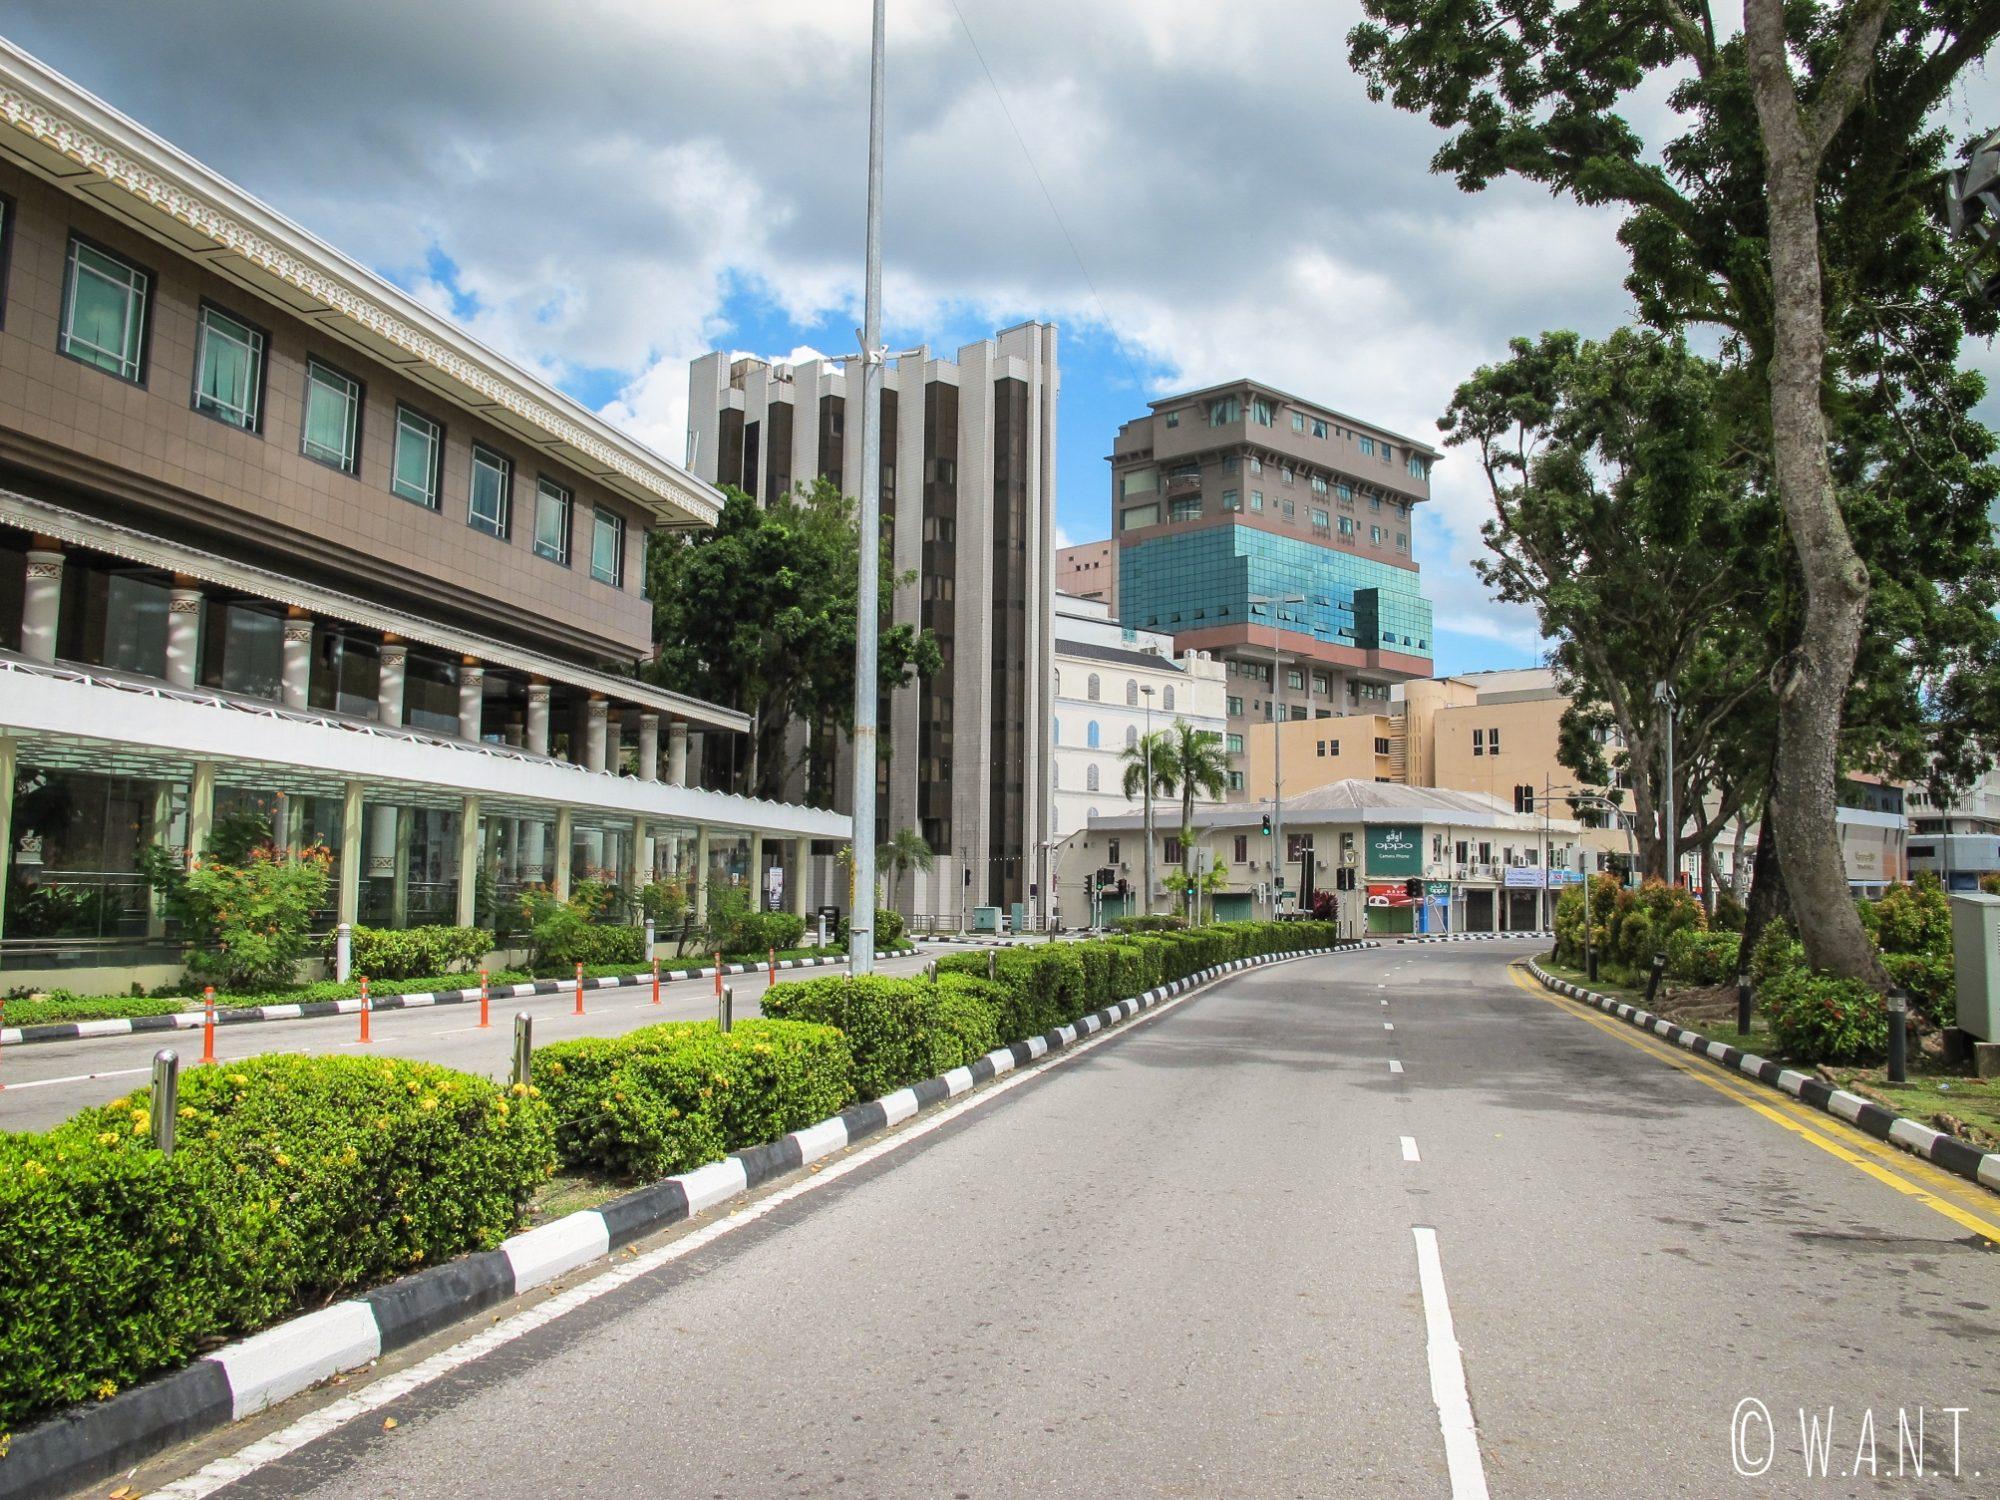 Aucune circulation dans les rues de Bandar Seri Begawan le vendredi de 12h00 à 14h00